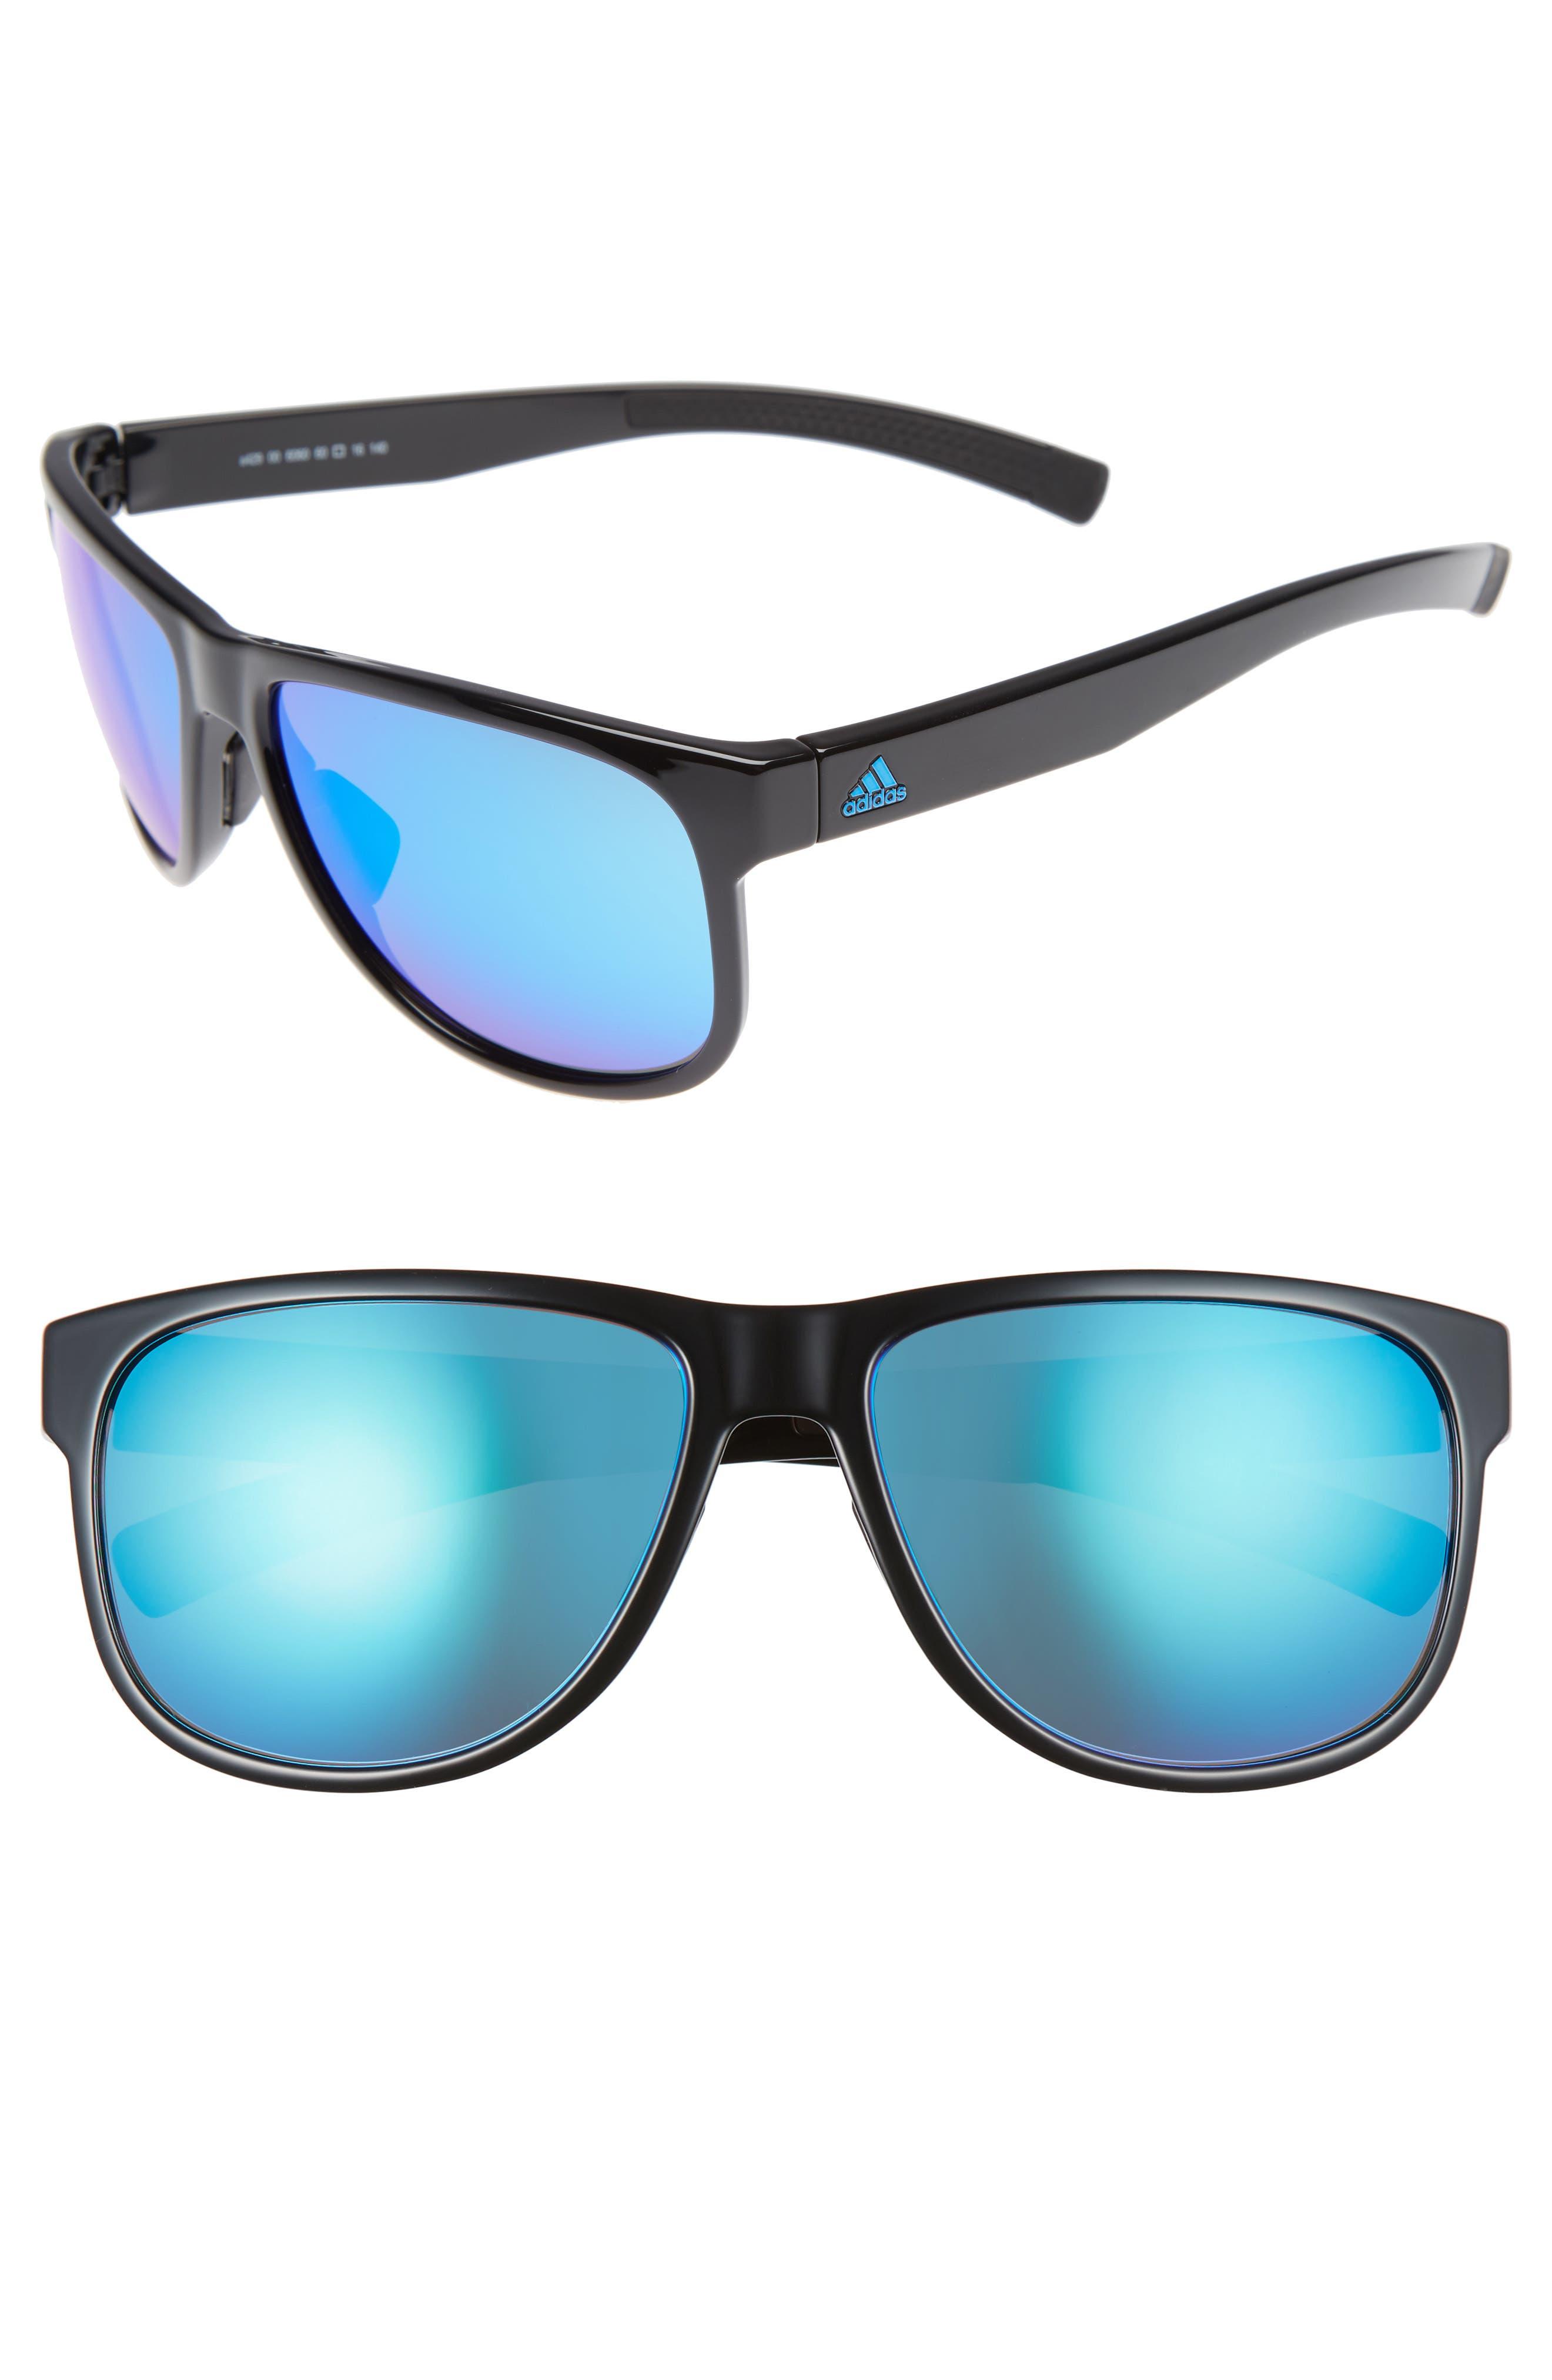 Sprung 60mm Sunglasses,                             Main thumbnail 1, color,                             400